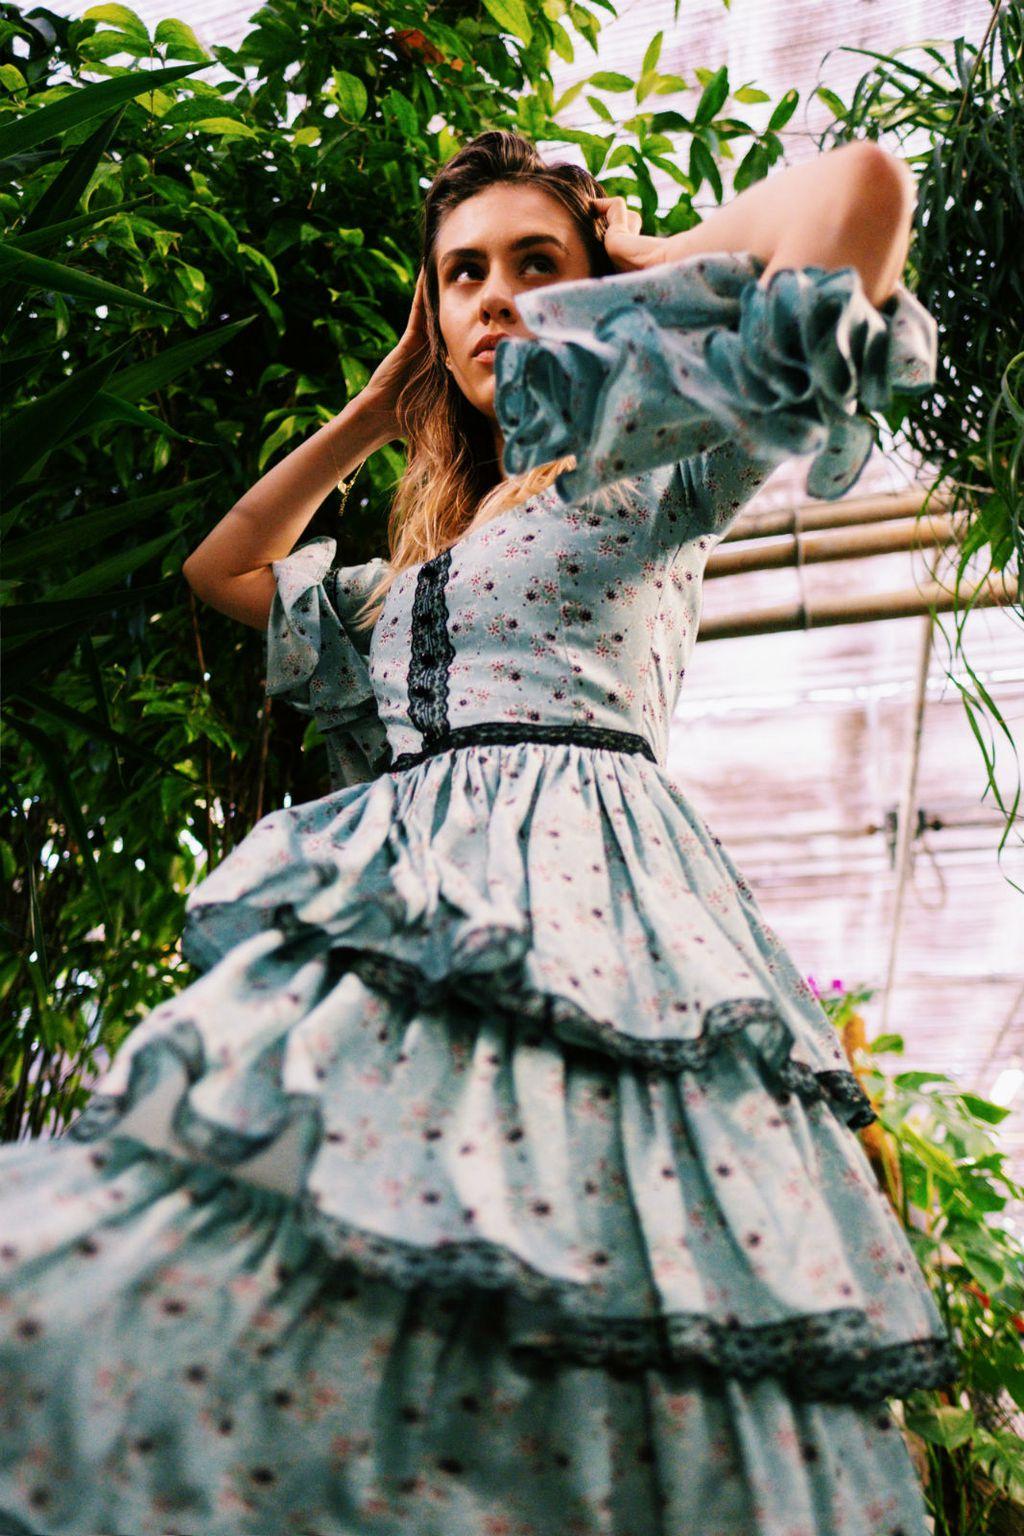 Nova kolekcija haljina brenda Lilith by Katarina Baban - 6